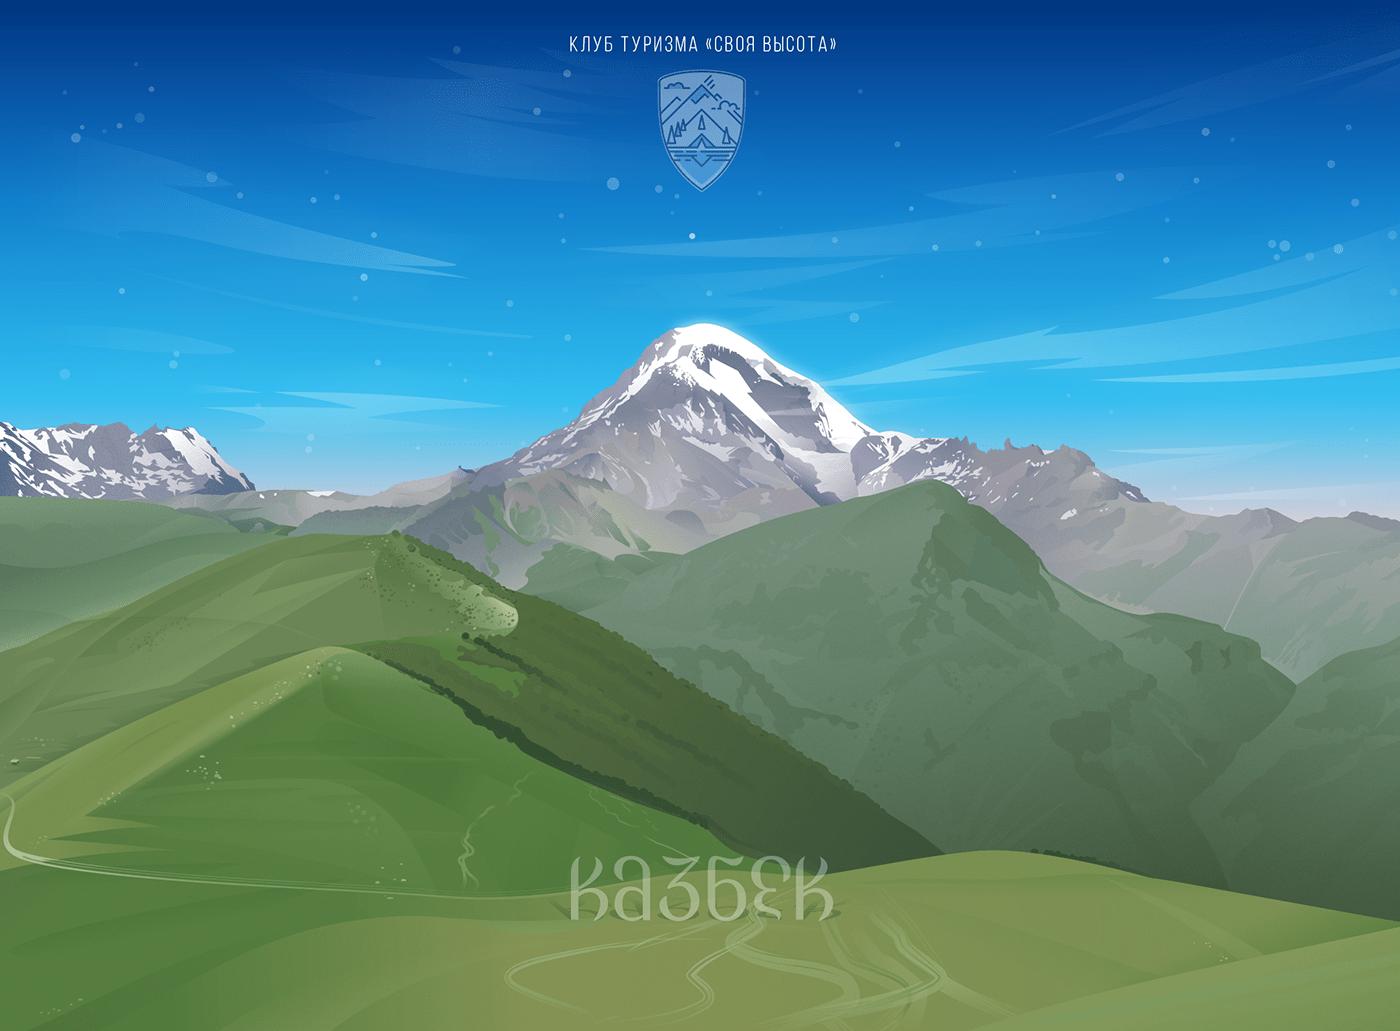 Image may contain: mountain, nature and screenshot